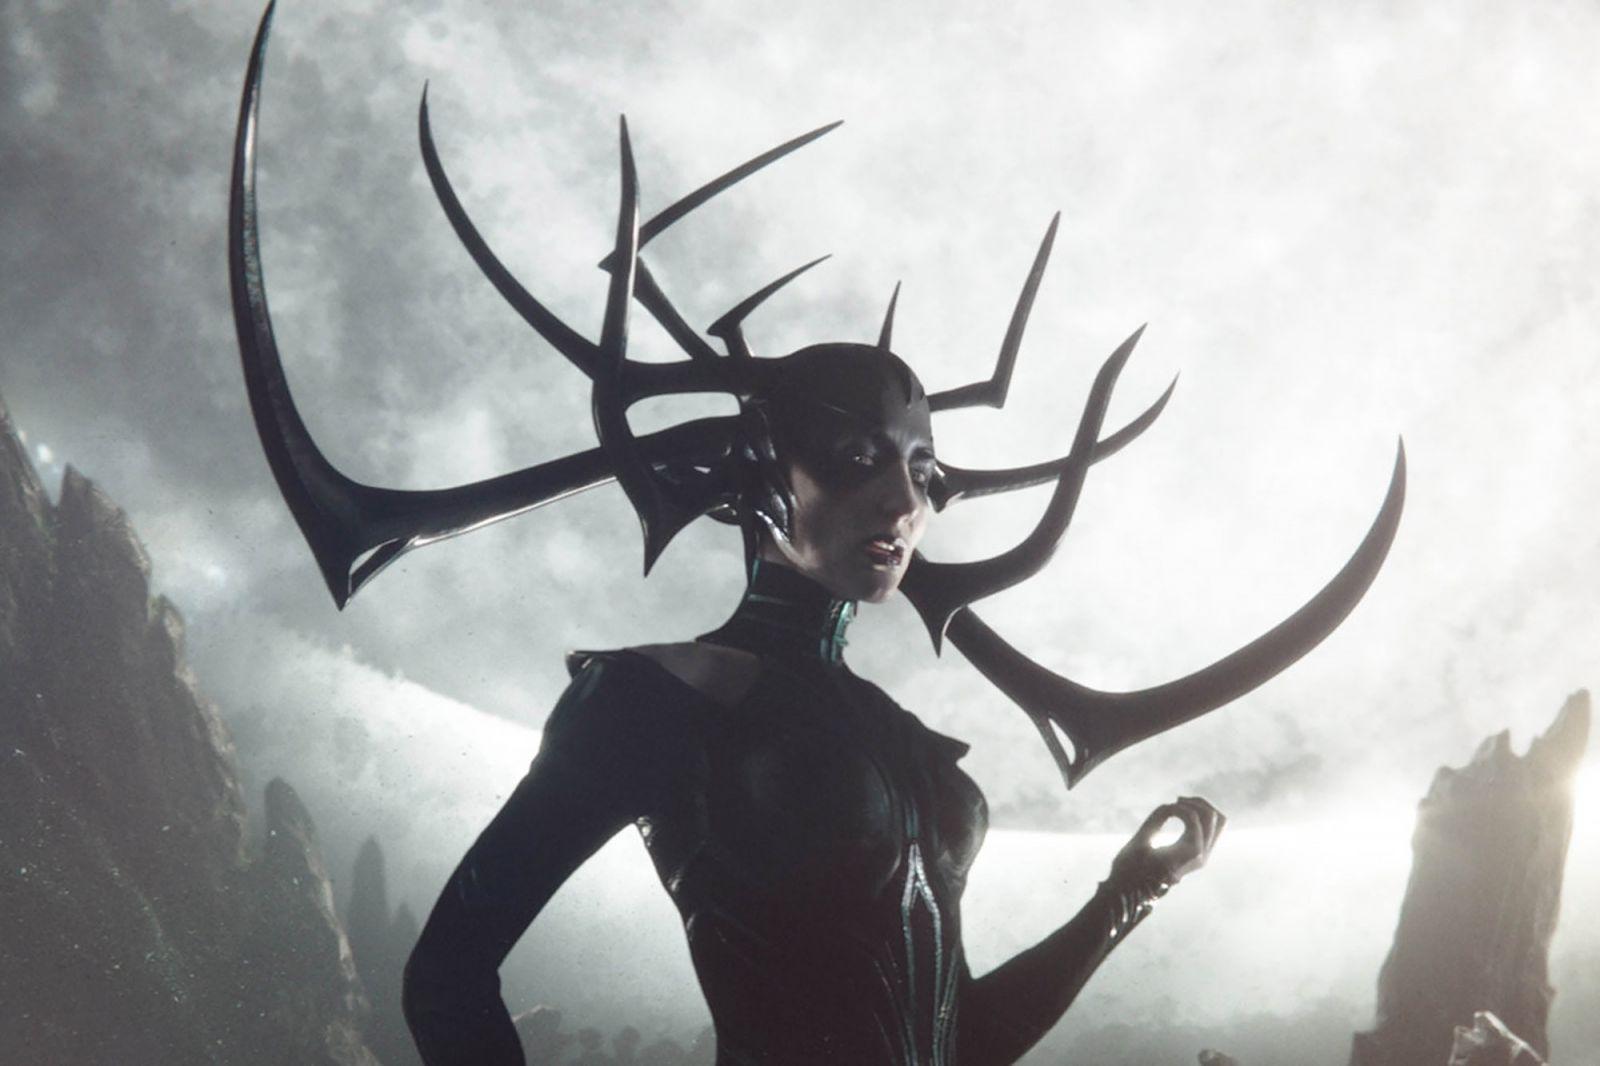 Cate Blanchett in Thor Ragnarok